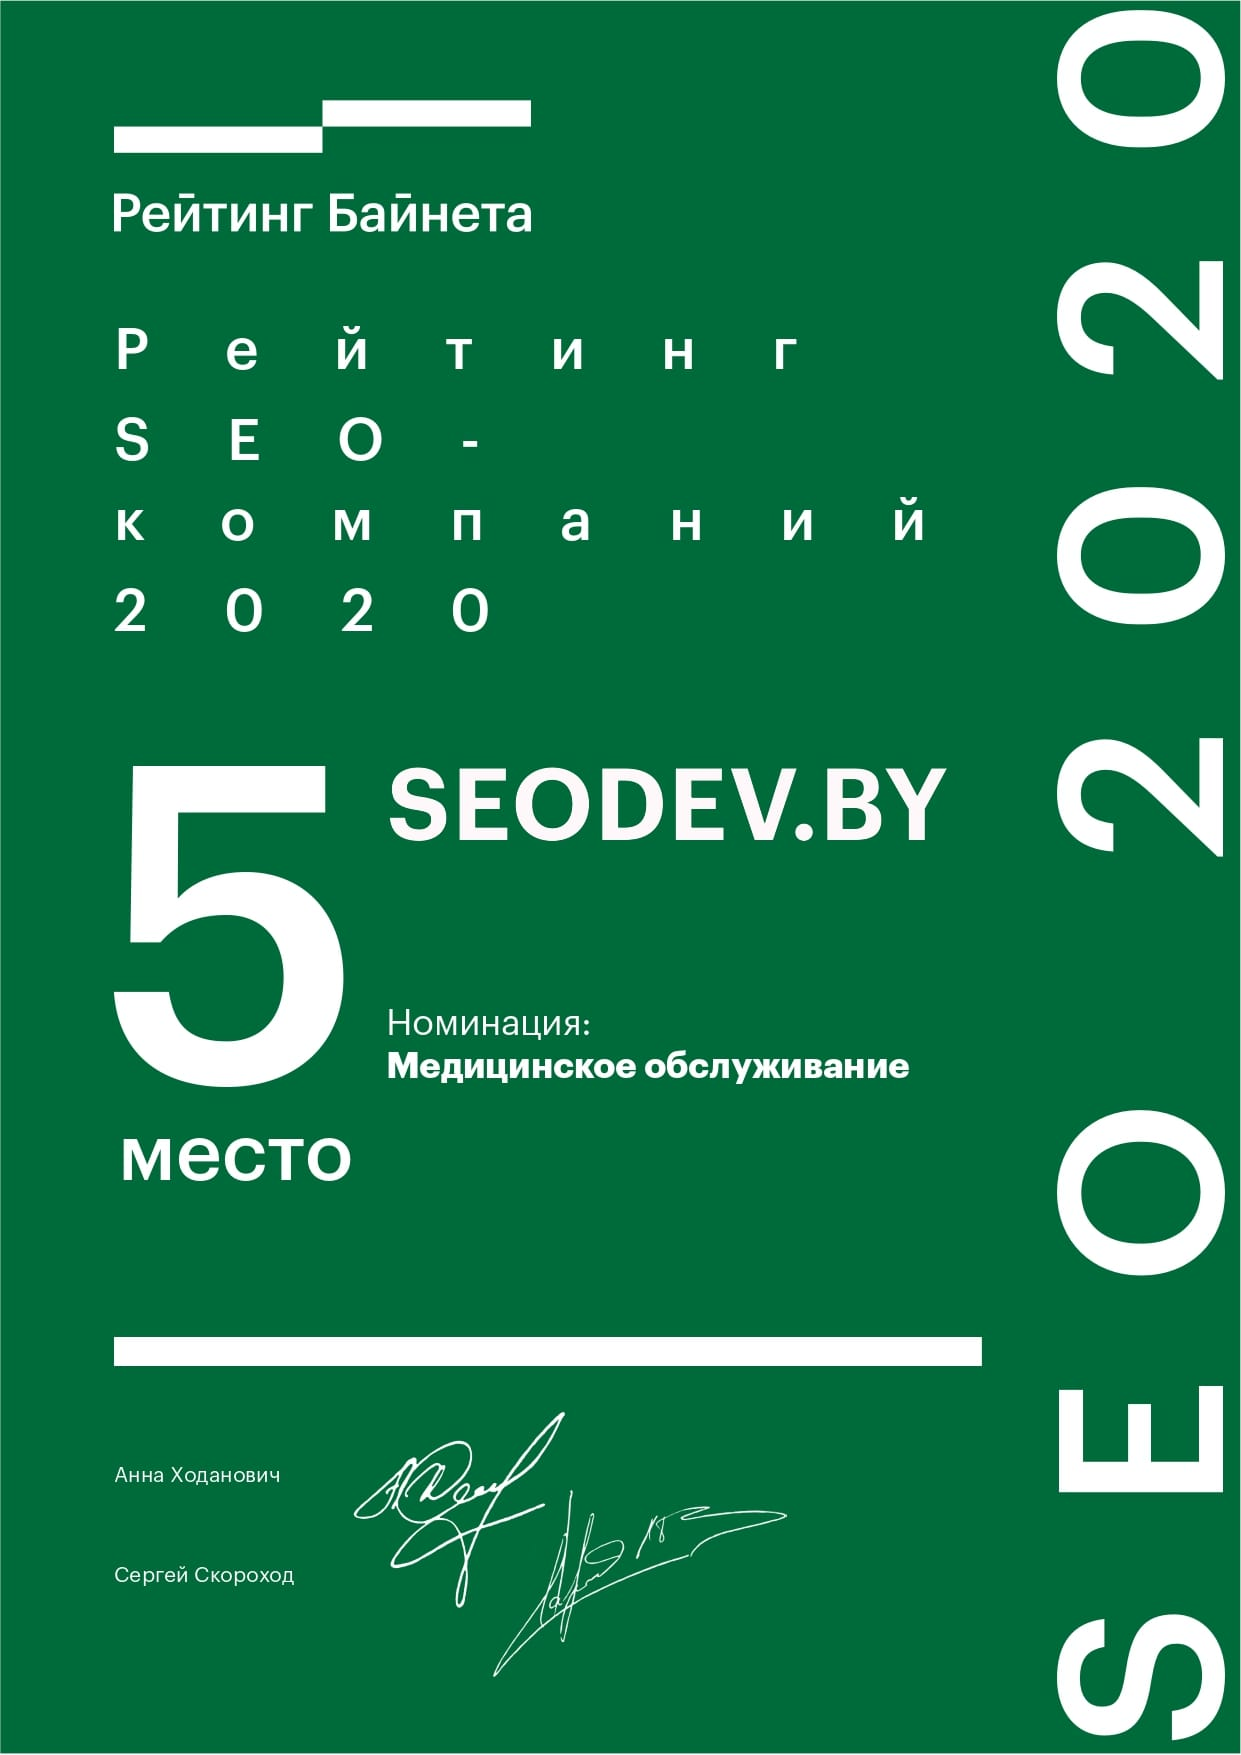 SEO_spec_page-0003